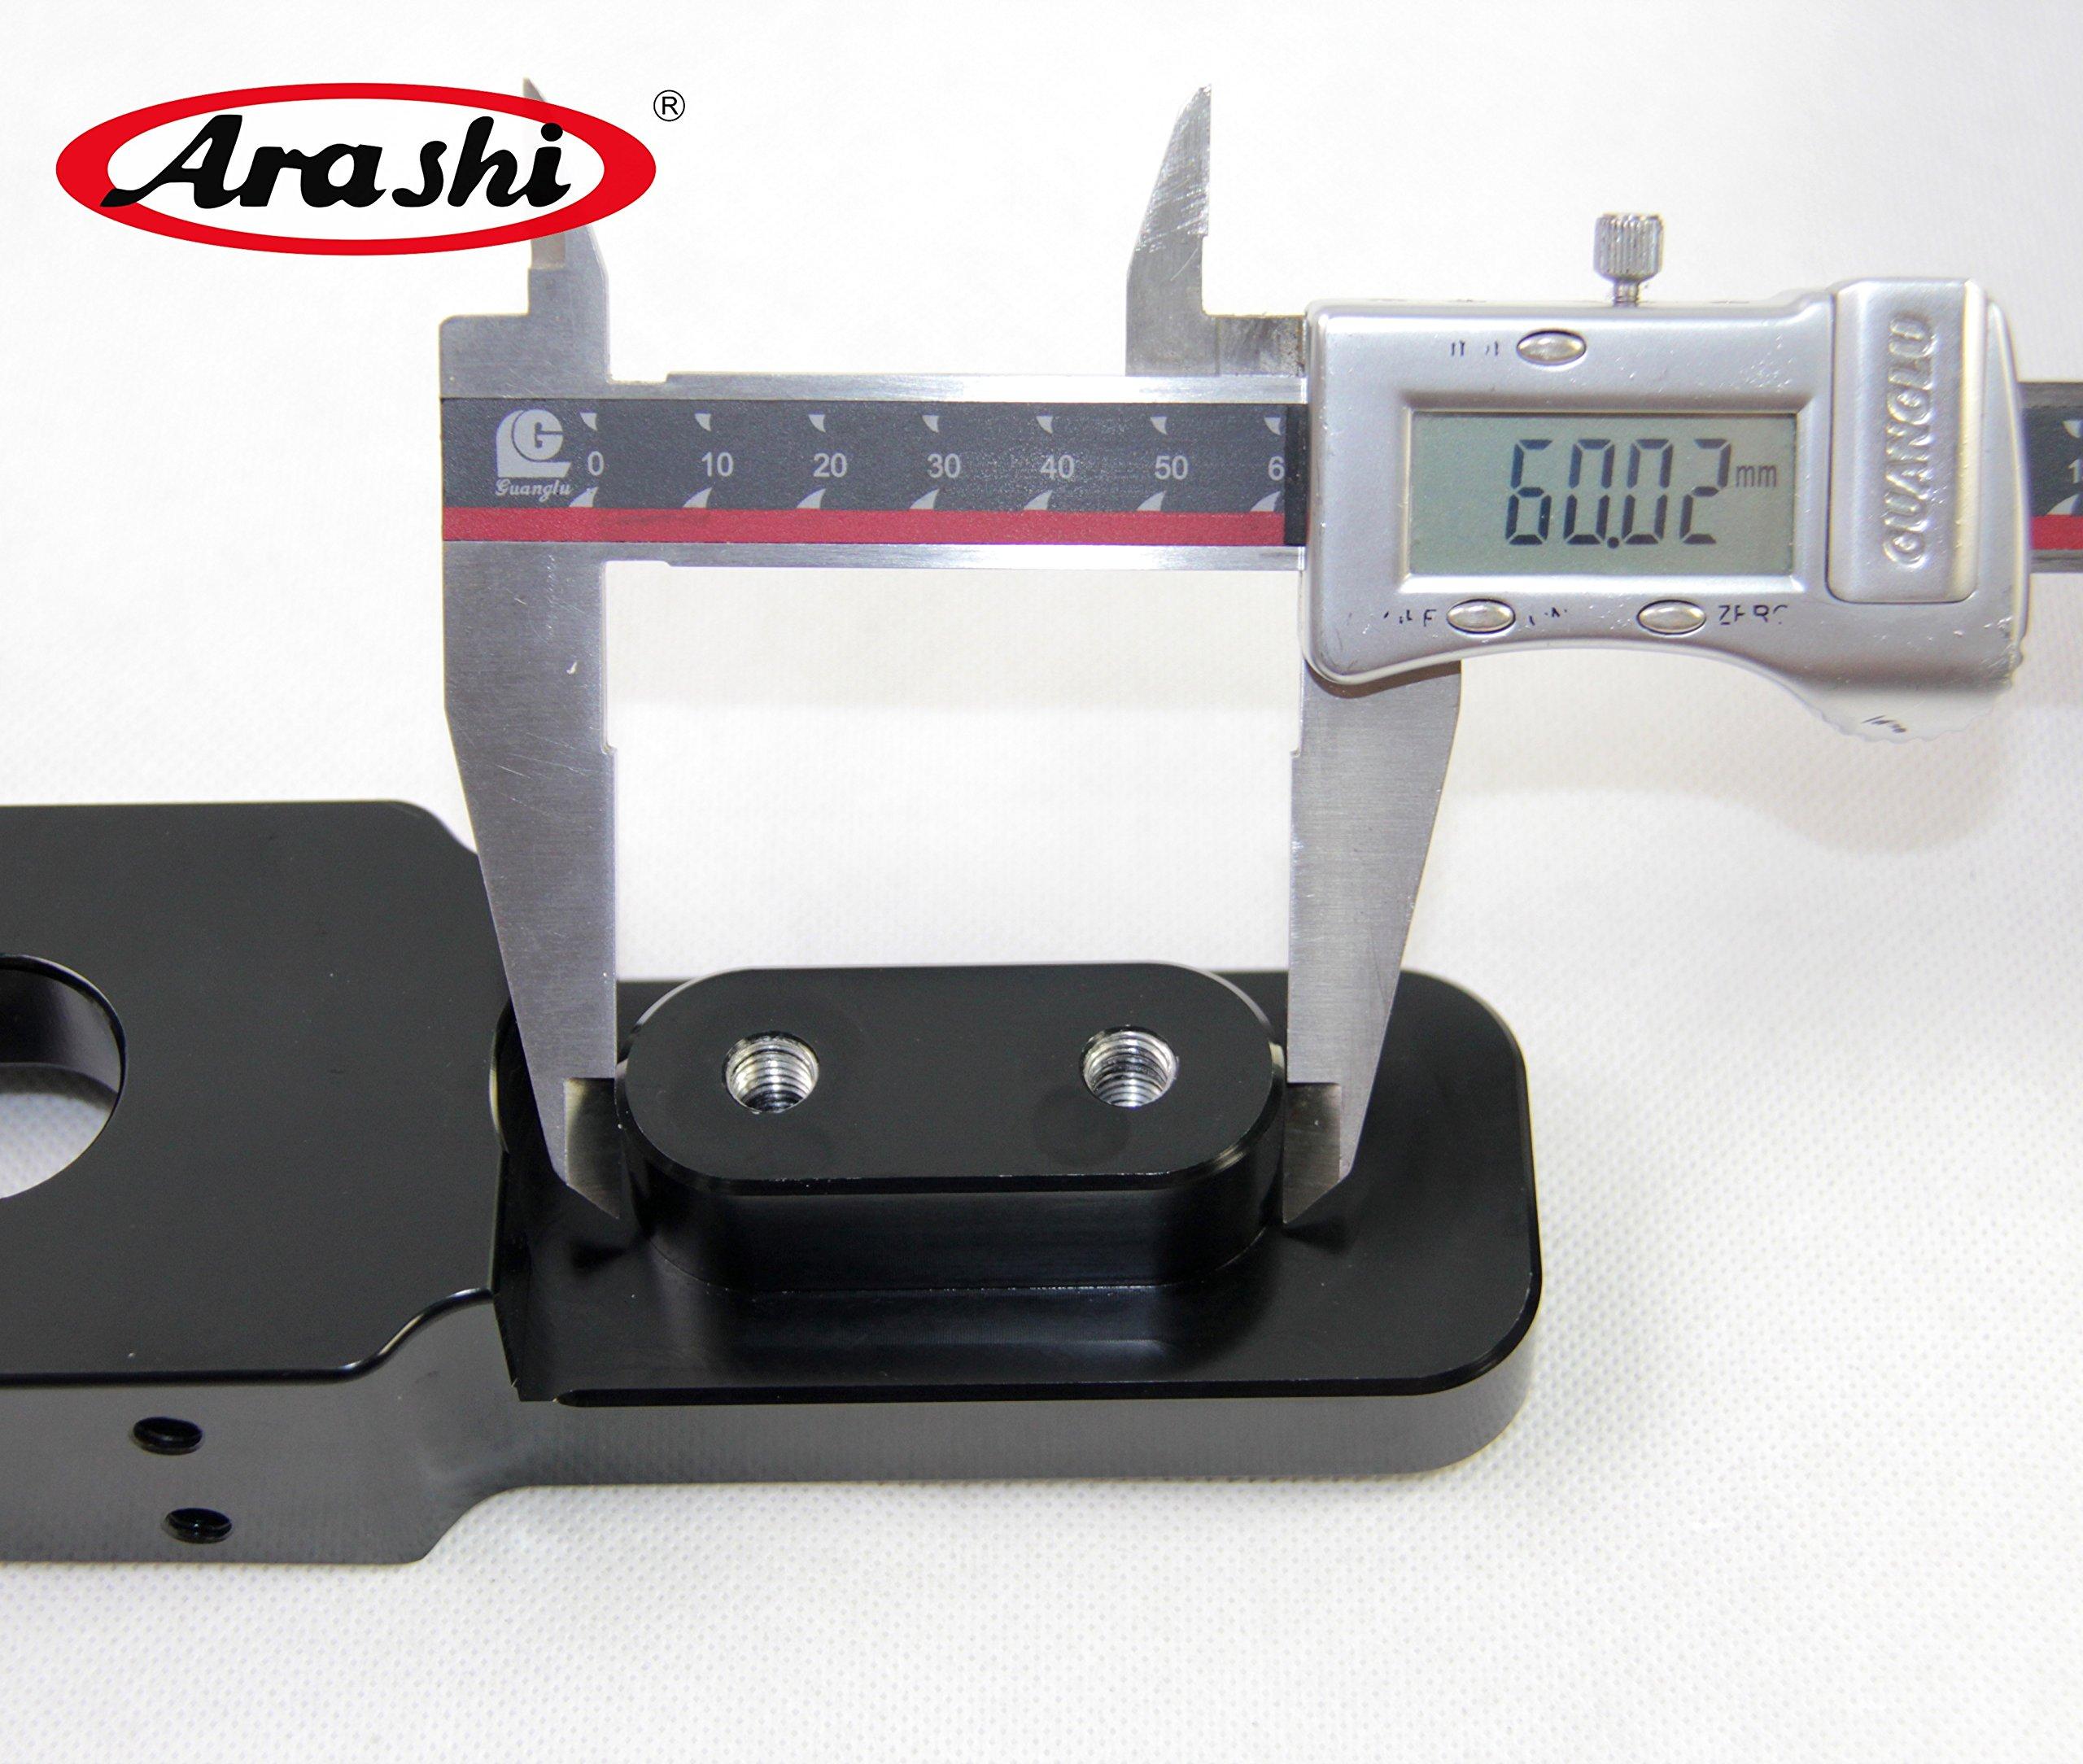 Arashi Swingarm Extended Kit Swing Arm Extension for Honda CBR1000RR by Arashi (Image #5)